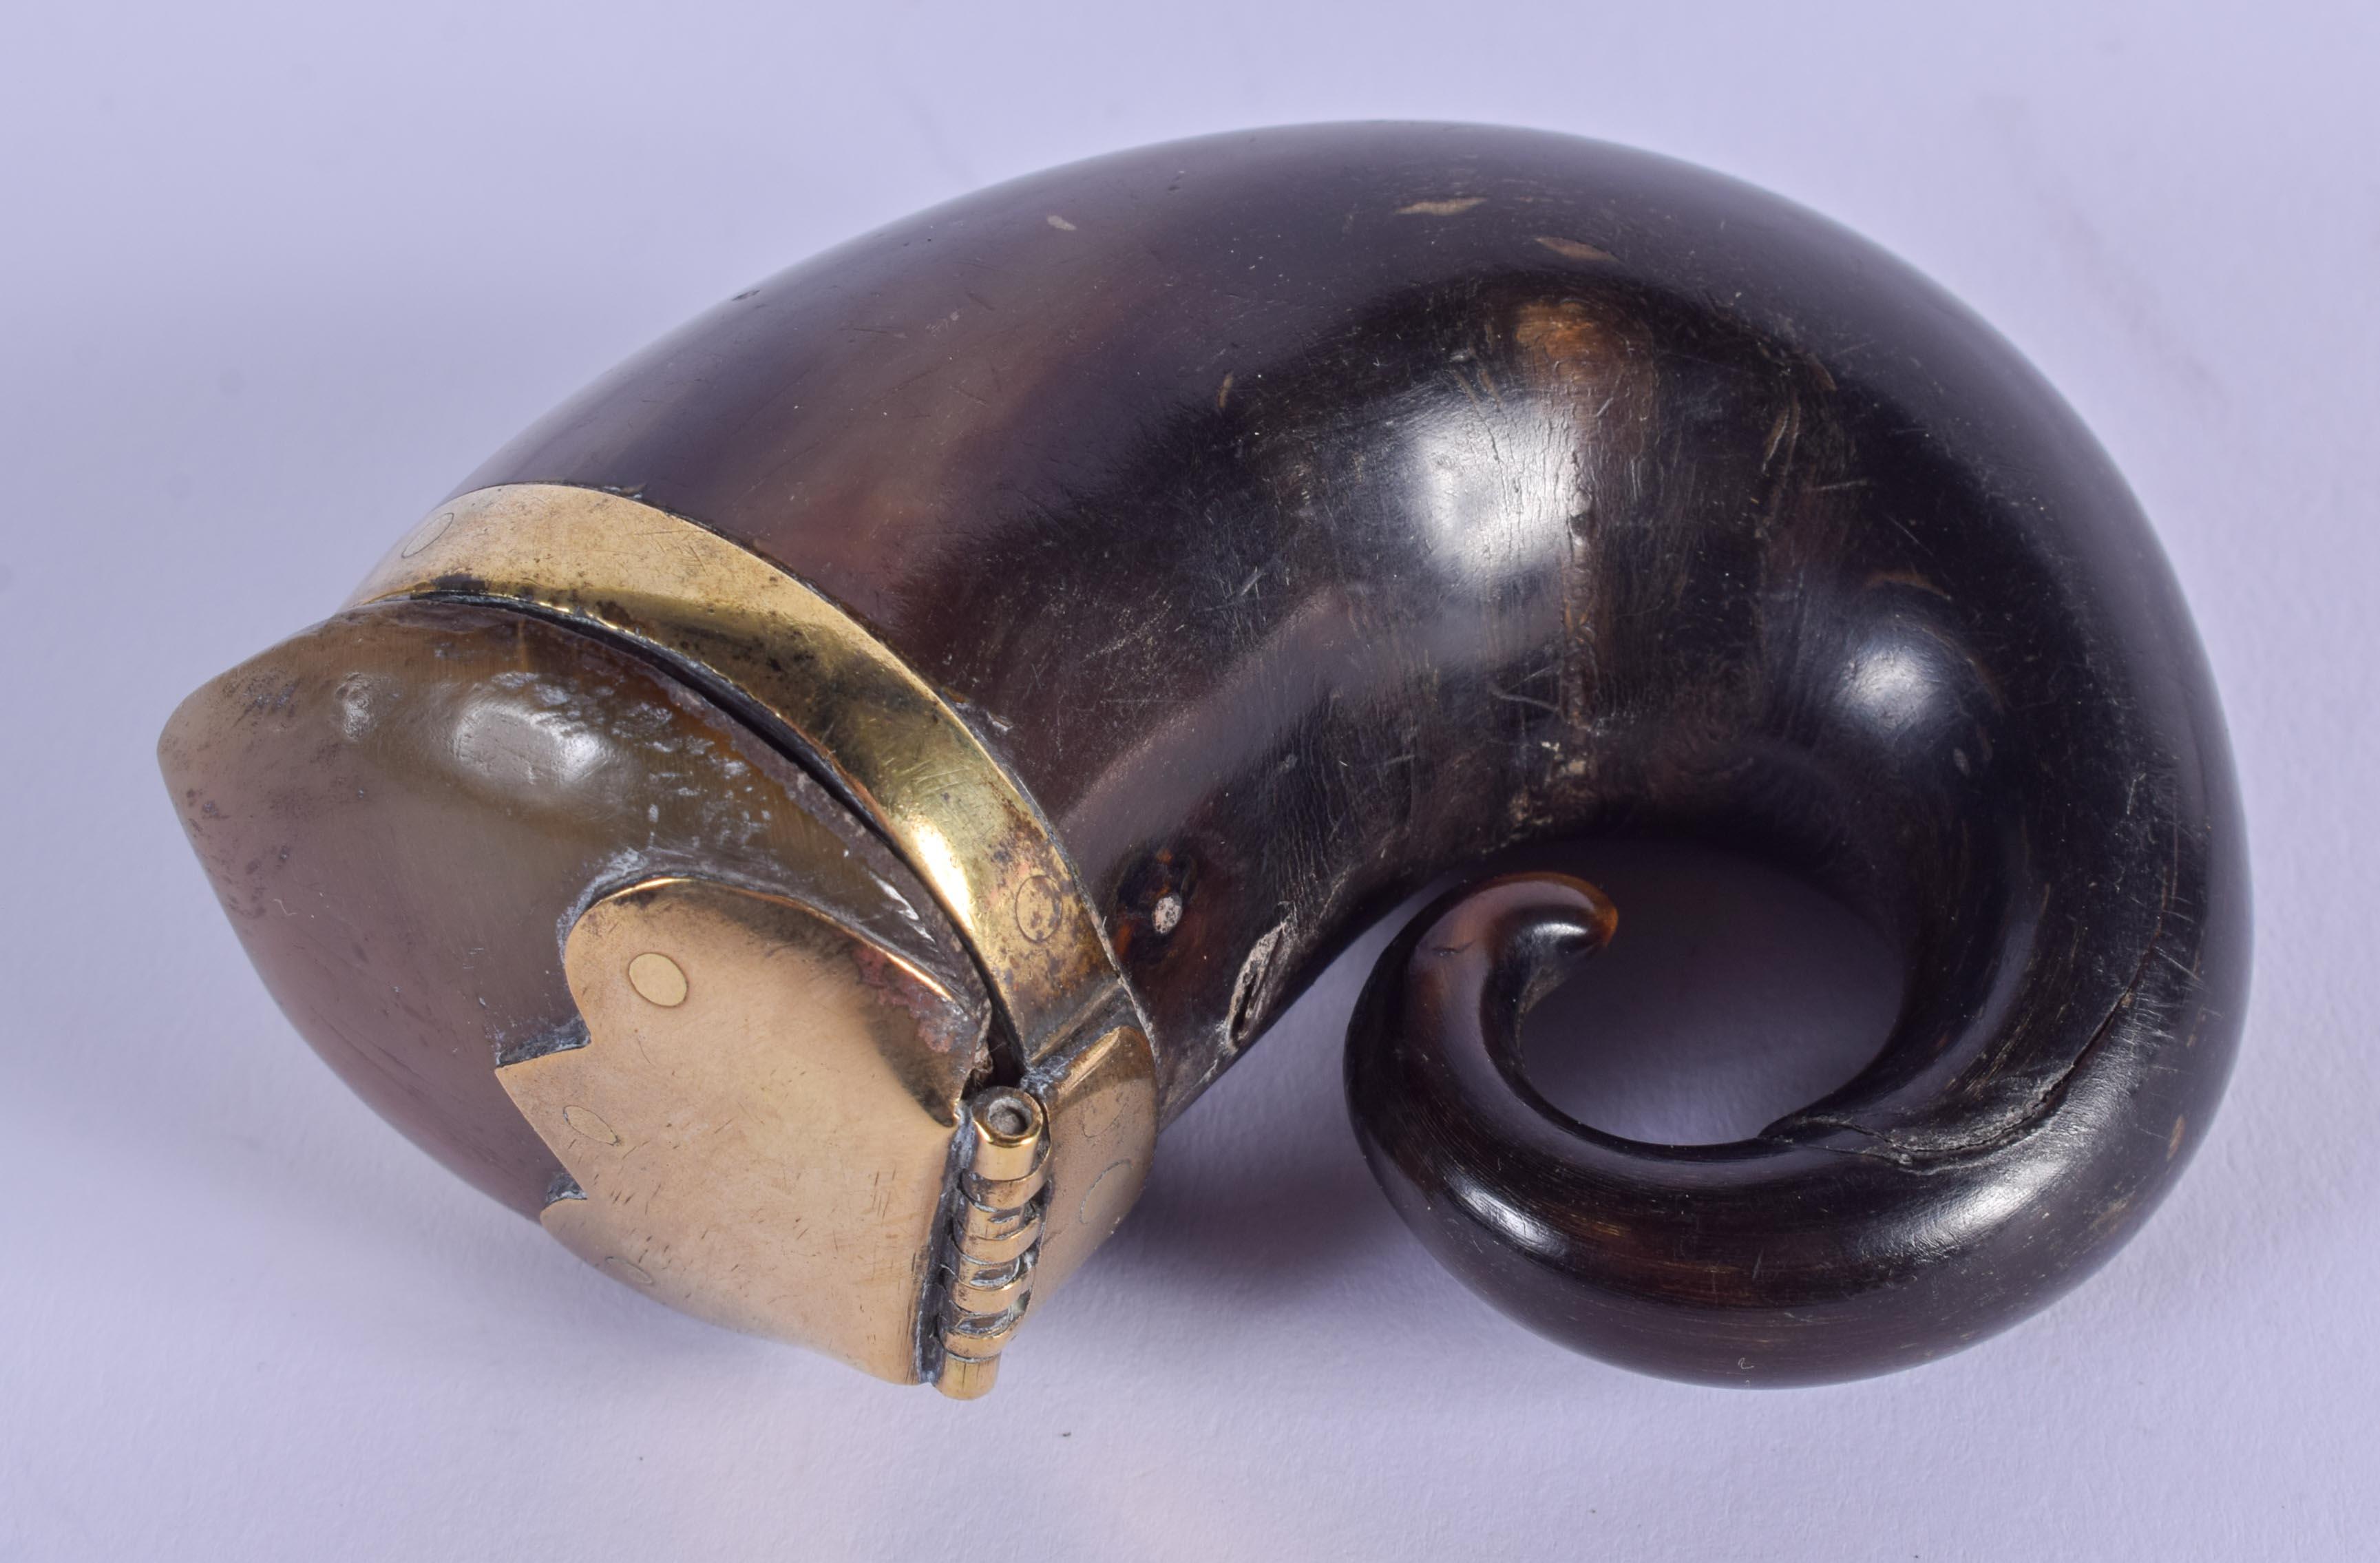 AN ANTIQUE SCOTTISH HORN SNUFF MULL. 6 cm x 6.5 cm.